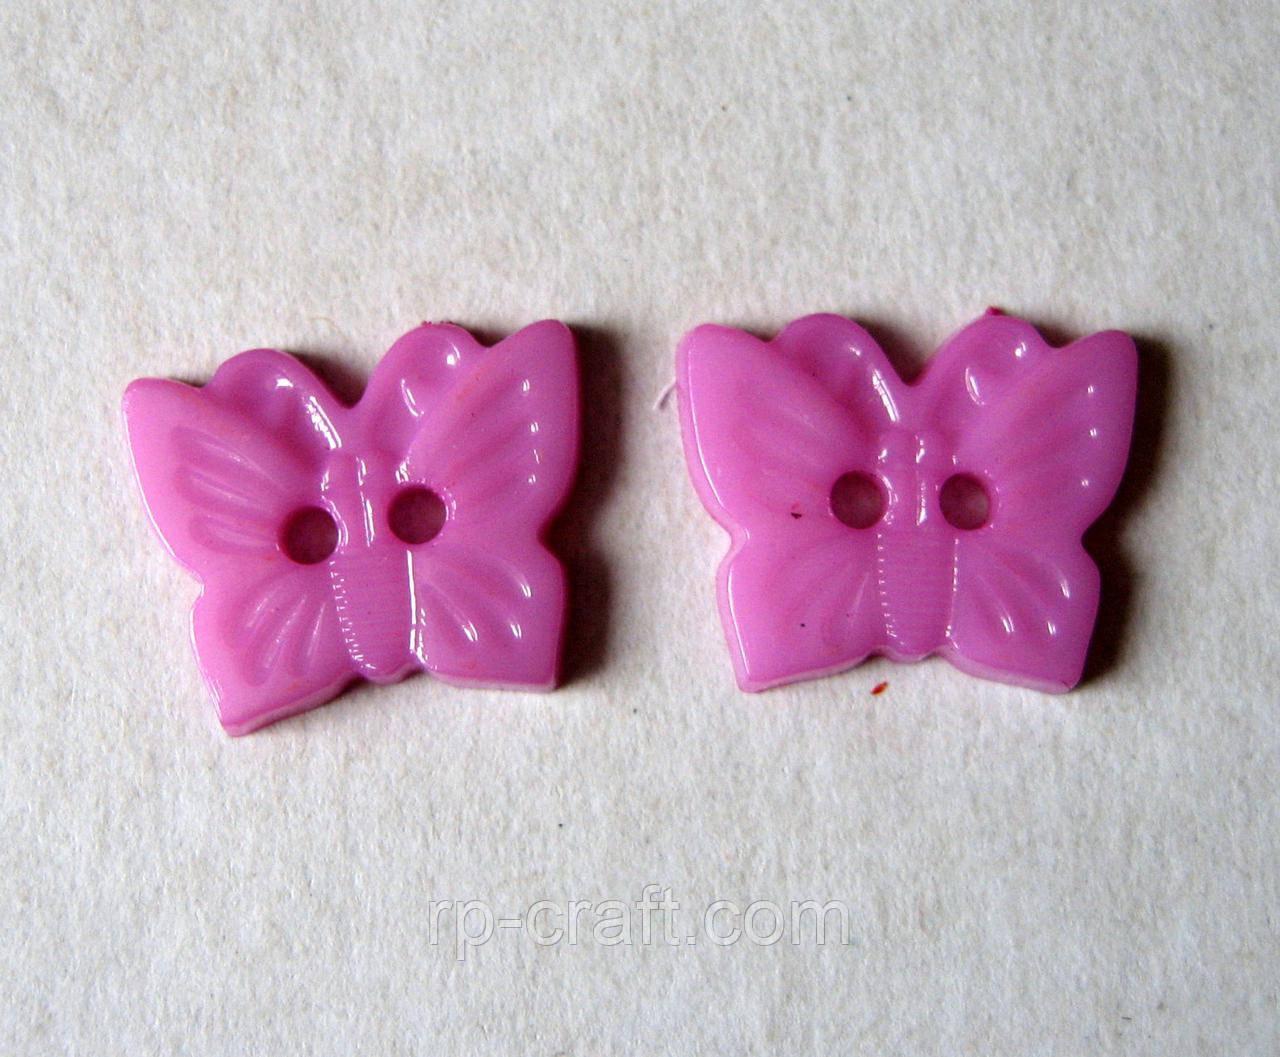 Пуговица пластиковая, декоративная, фигурная, бабочка сиреневая, 13х16 мм